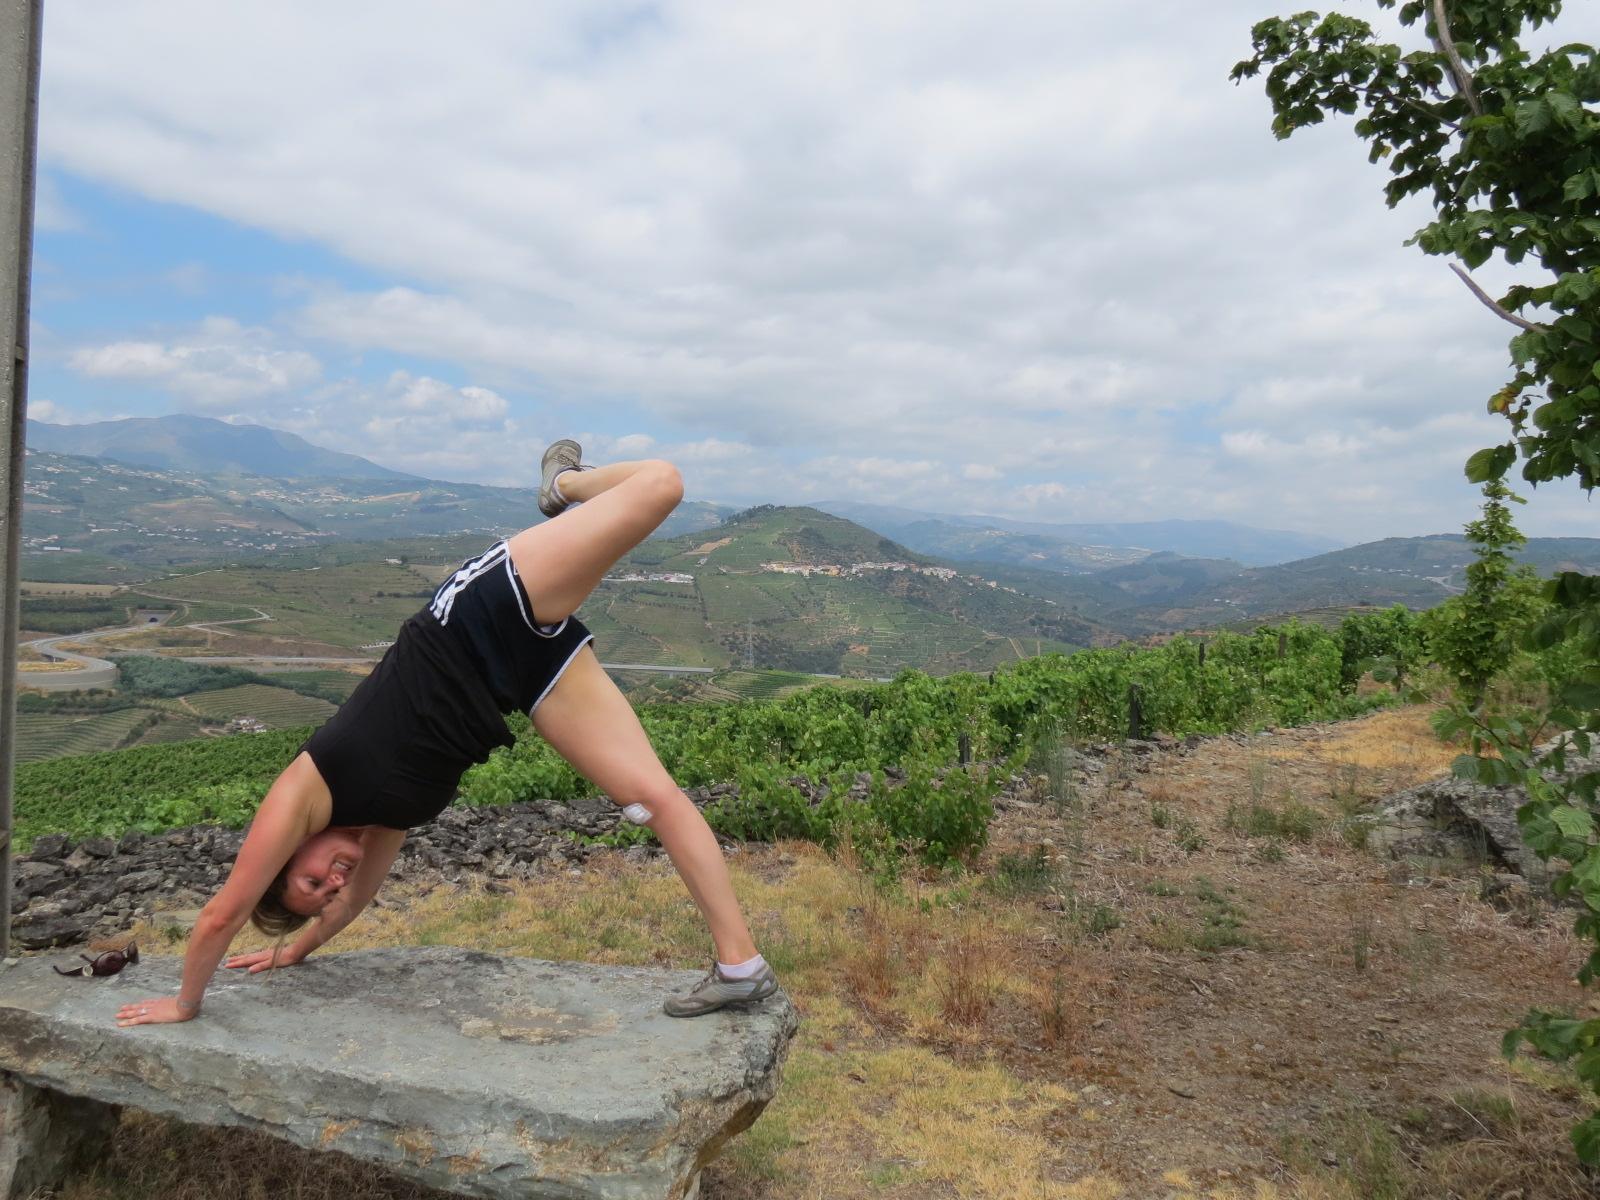 Morning yoga in the vineyards of Quinta do Vallado, Portugal